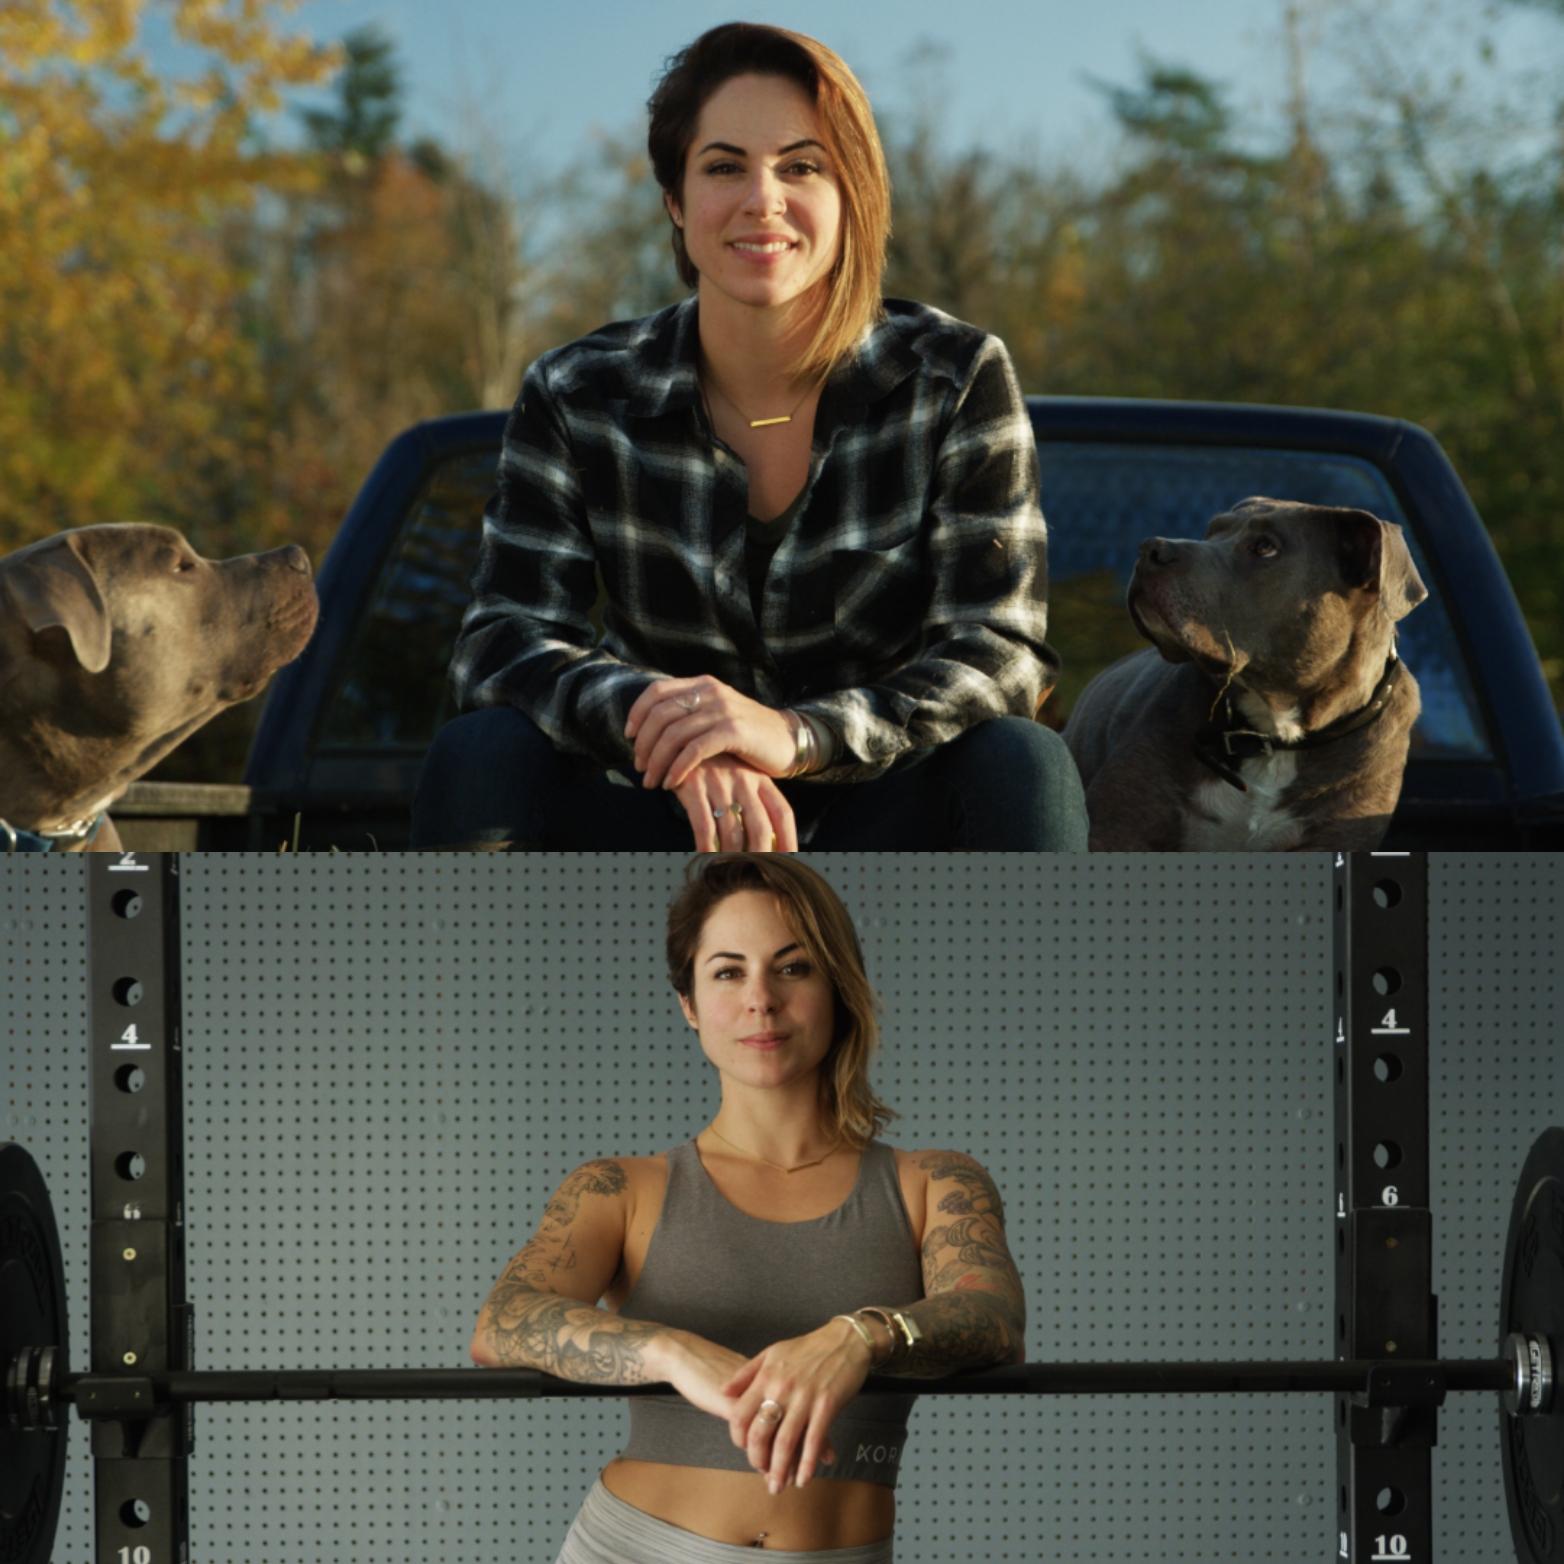 Ellie Margulies - NASM, Clubbell Yoga, BUTI Yoga 200 HR YTT, RAD Mobility 1&2. Motivator, dreamer, achiever.